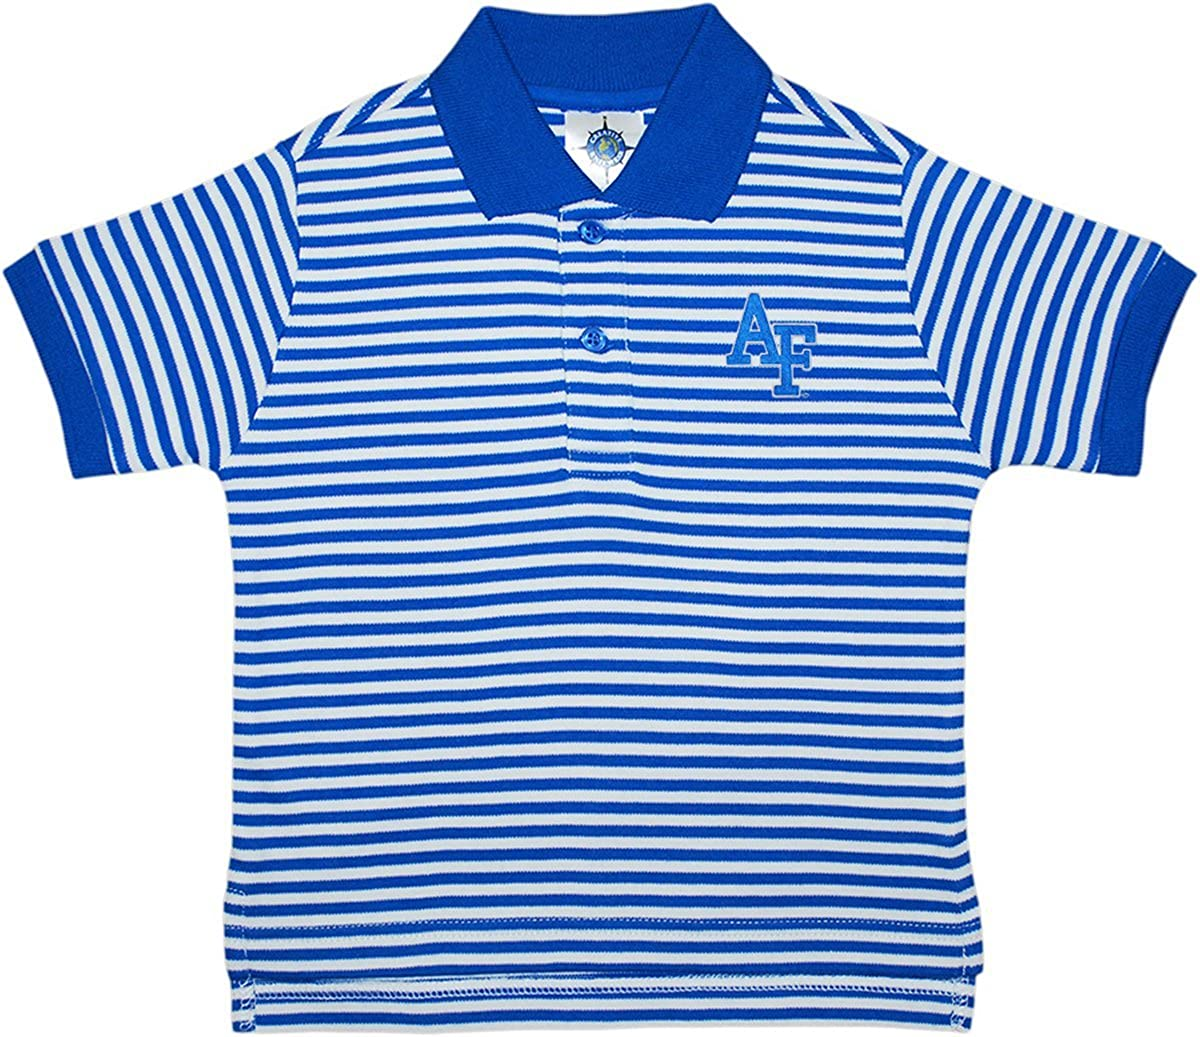 Creative Knitwear Air Force Academy Falcons Striped Polo Shirt